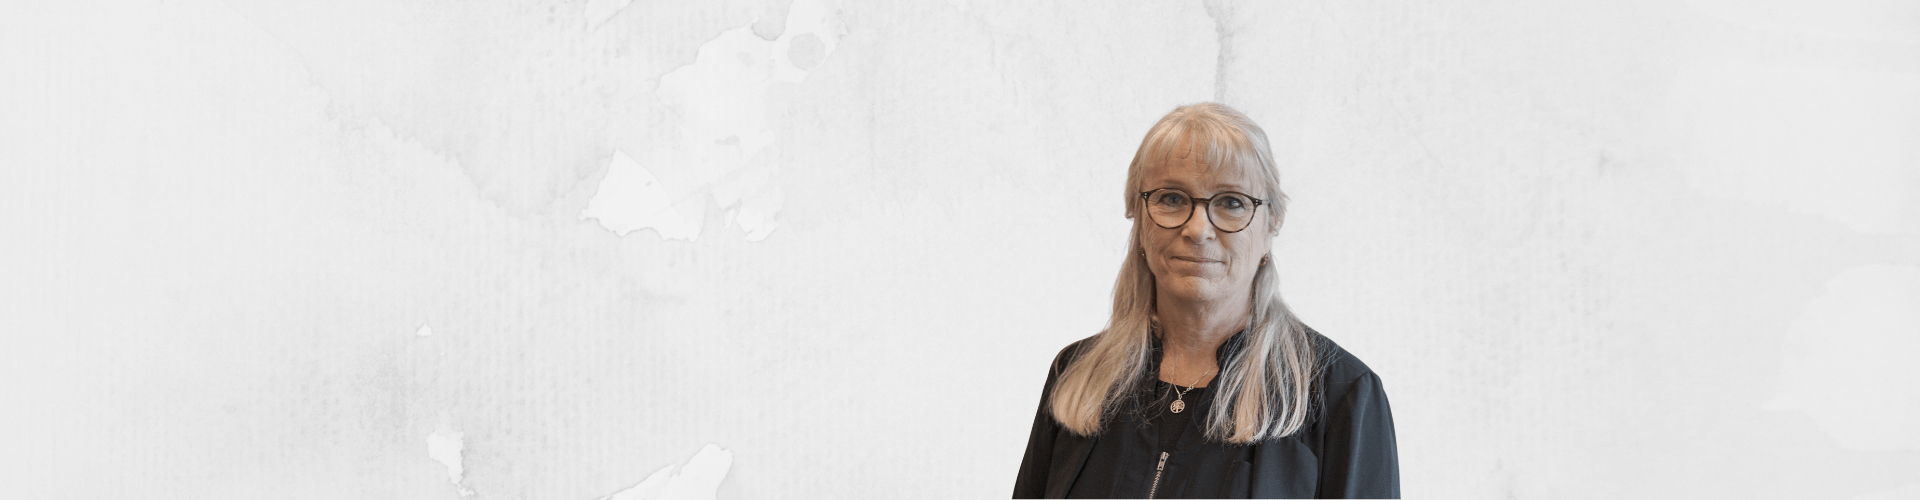 Lis Nørgaard